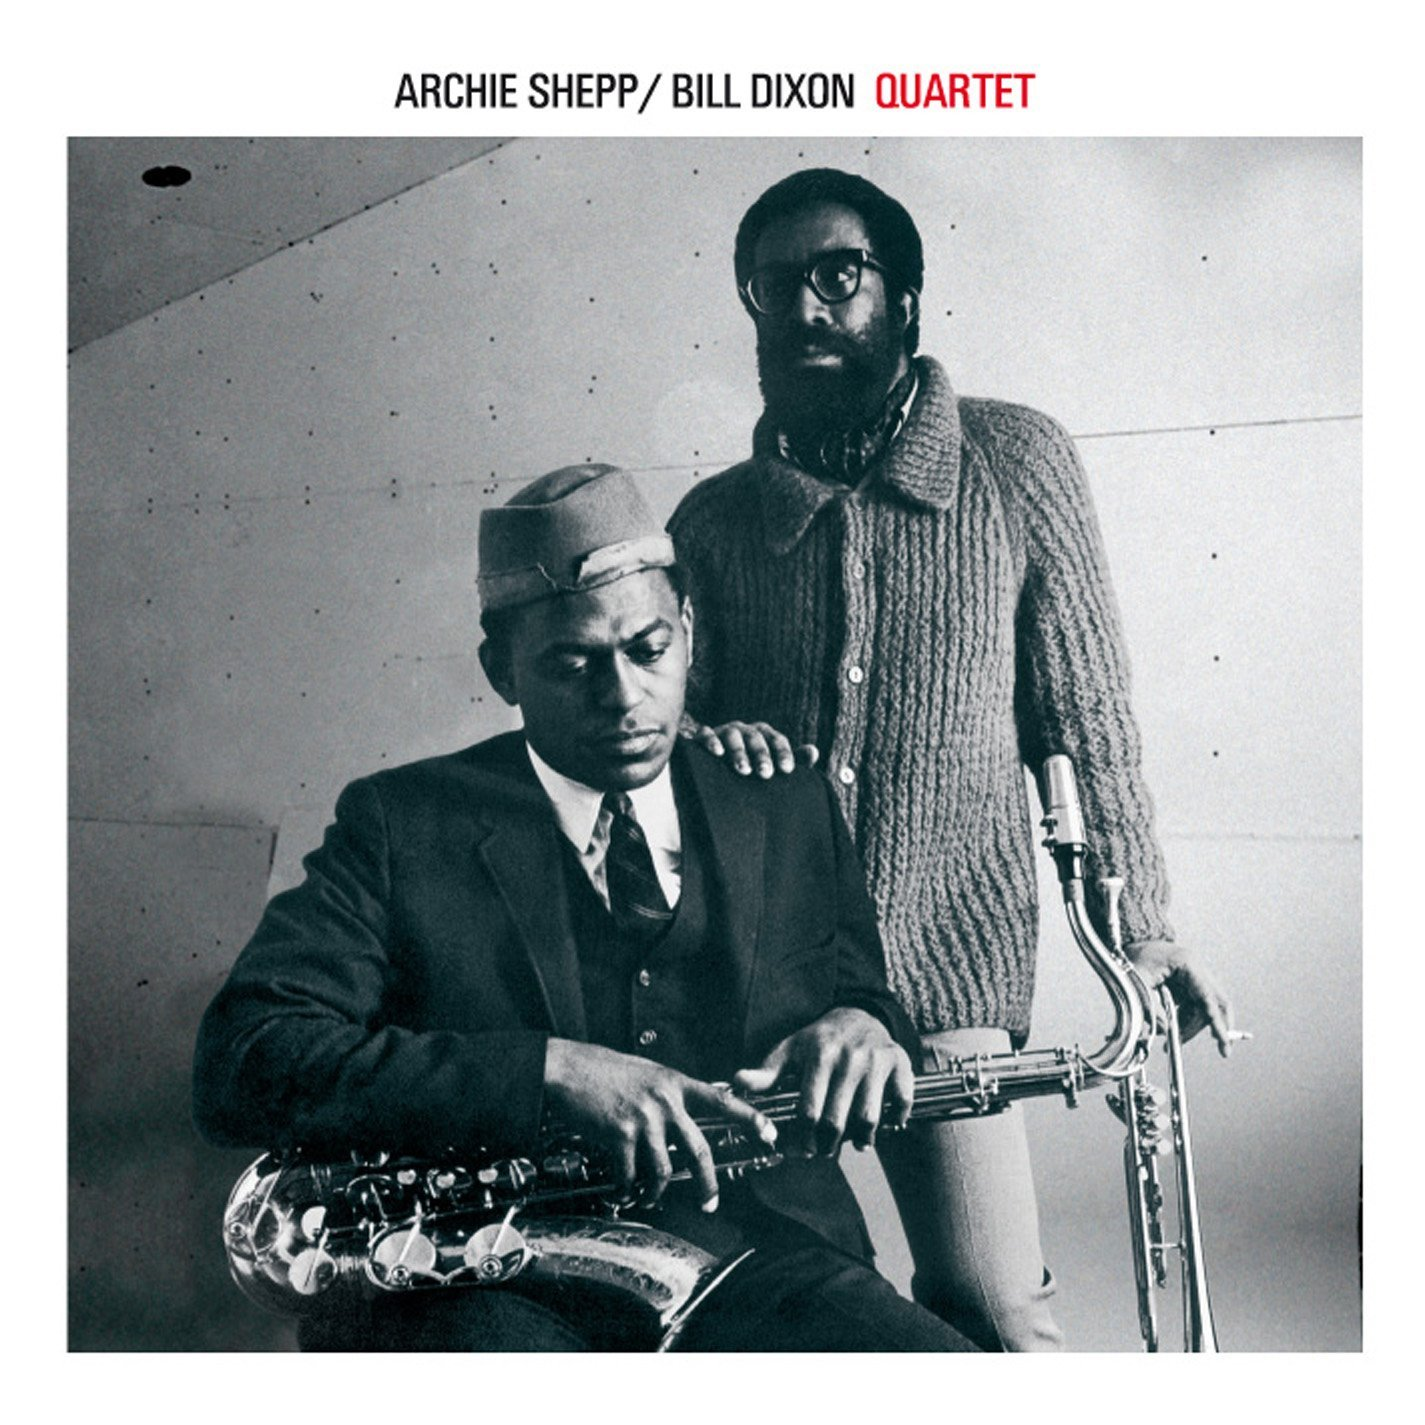 ARCHIE SHEPP, BILL DIXON - QUARTET (CD)